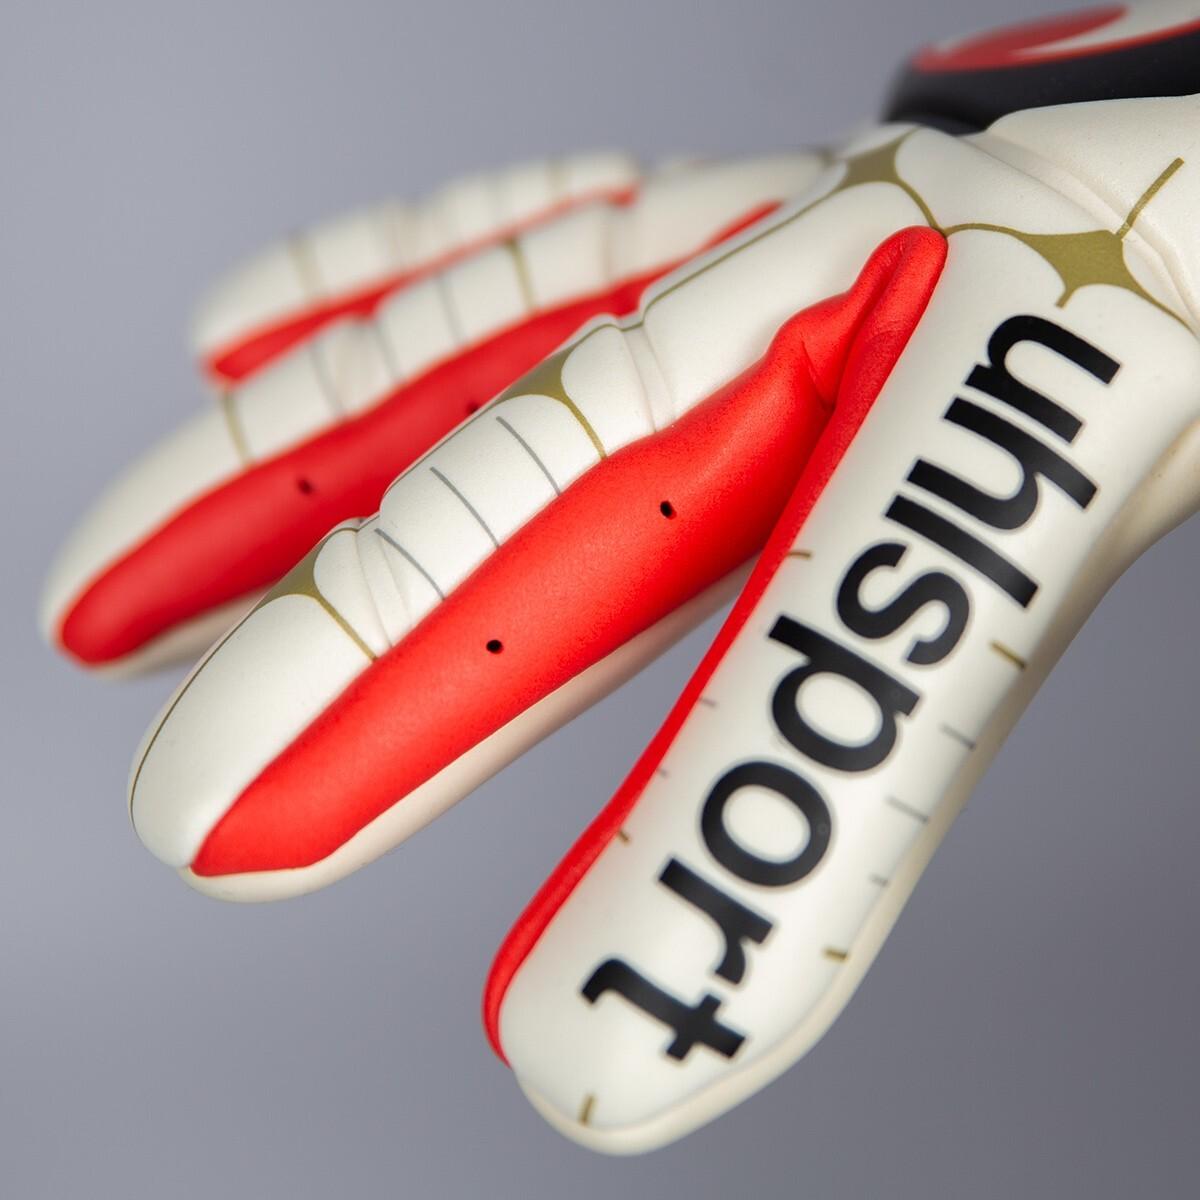 Robert Enke Handschuh Closeup